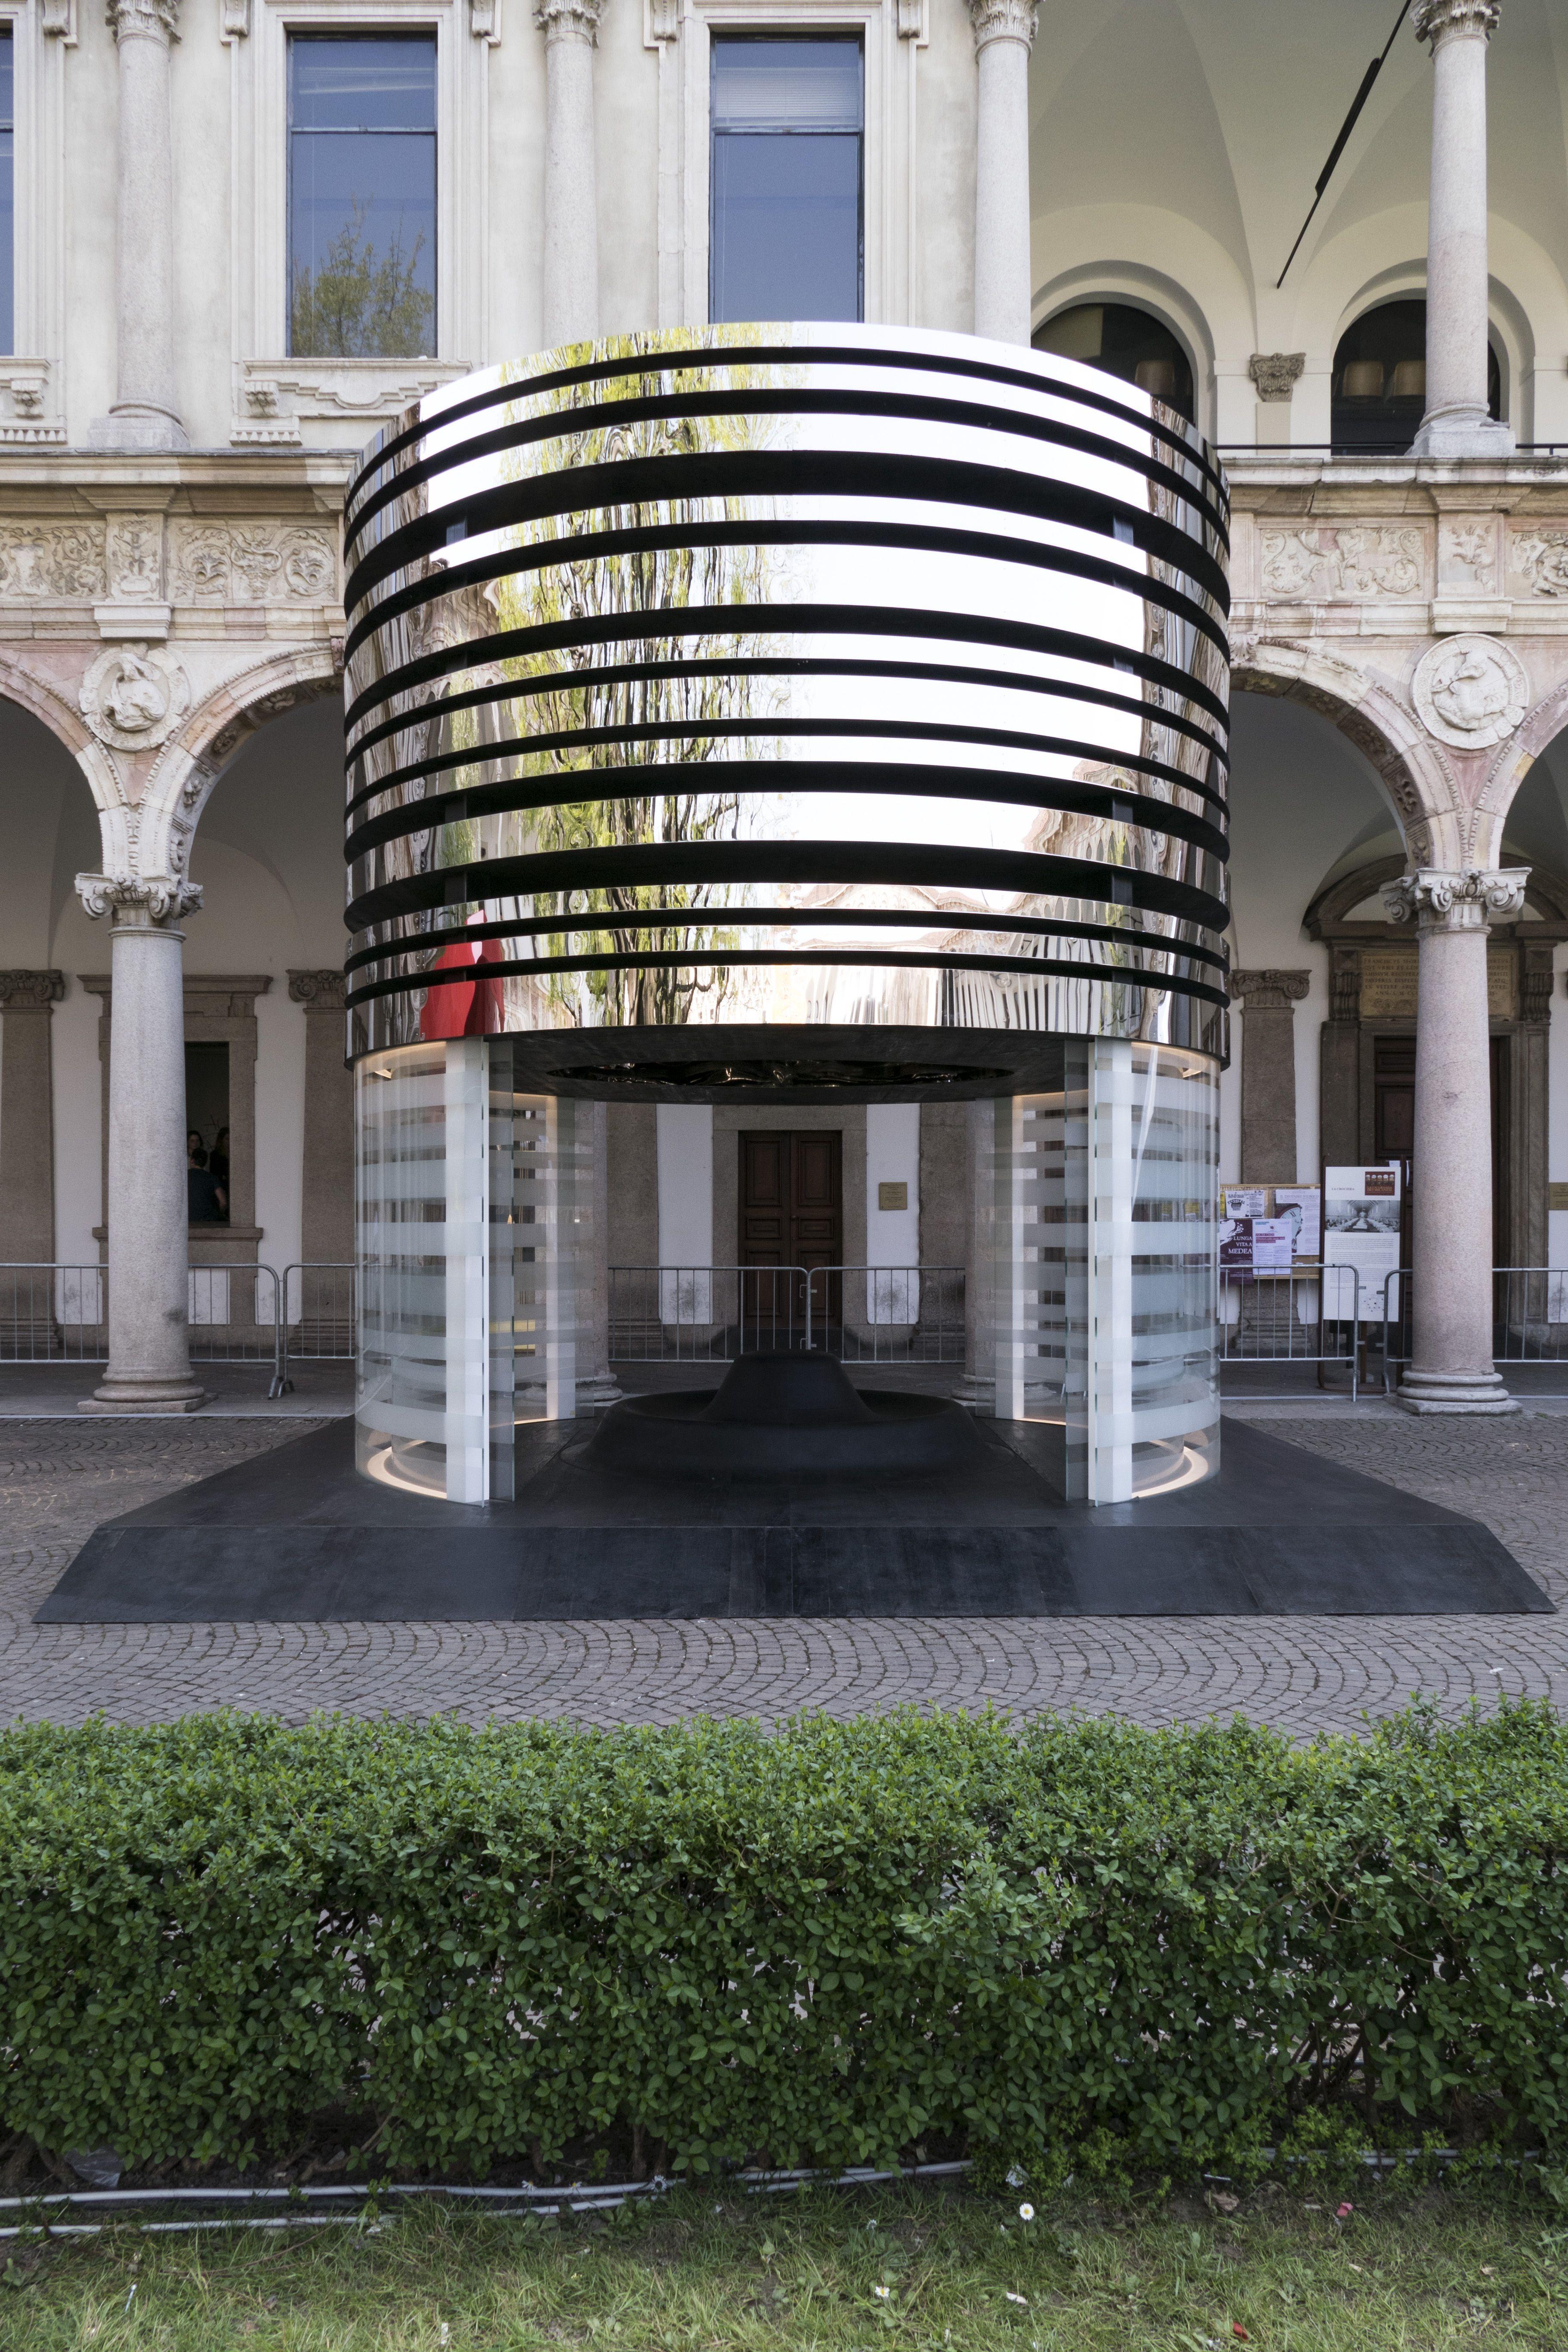 Black Hole #vetro #glass #milan #milanodesignweek #fuorisalone #design #architecture